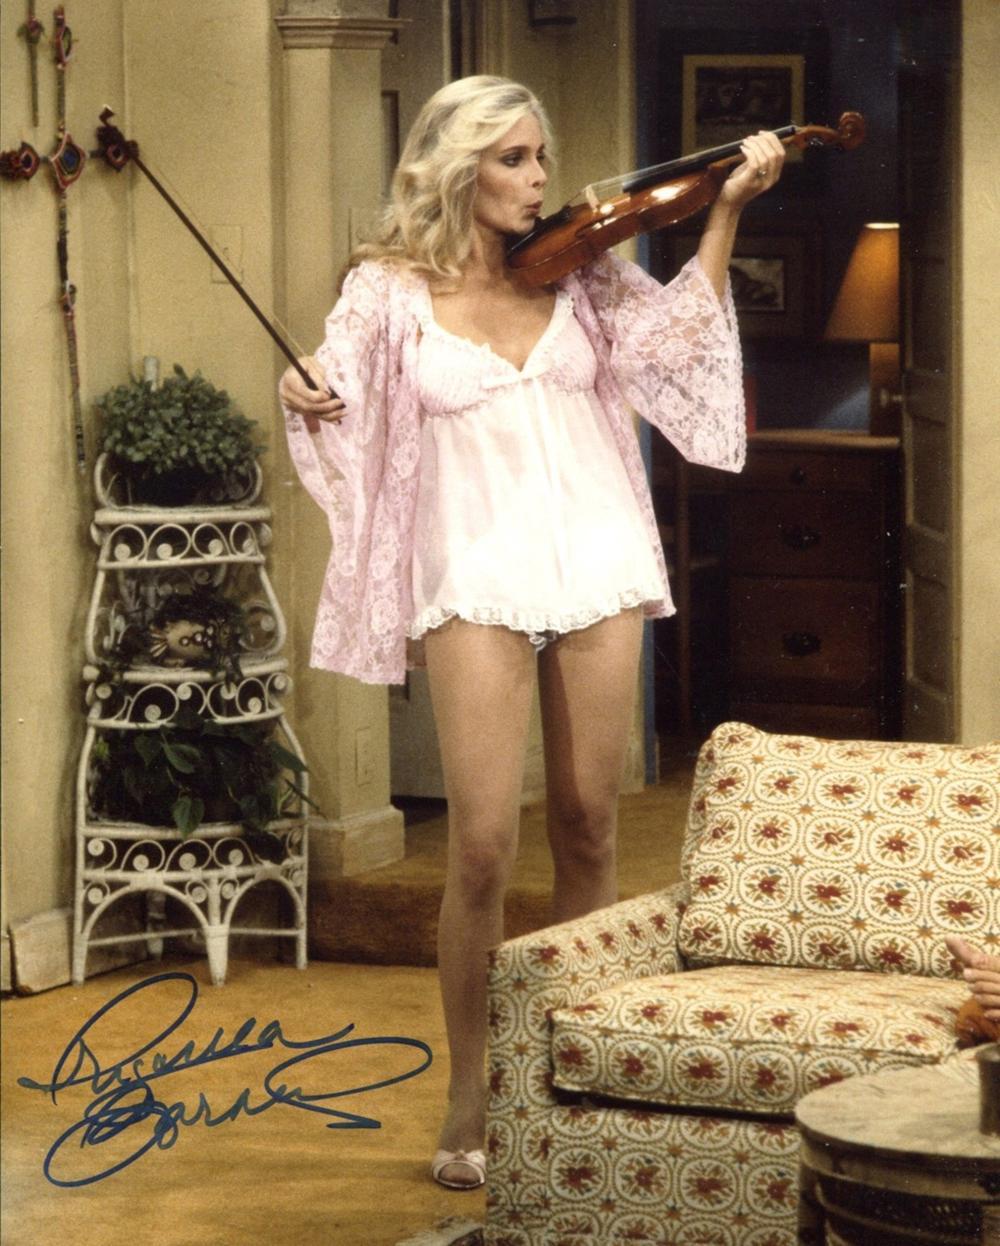 Three's Company comedy series actress Priscilla Barnes signed 8x10 photo. Good condition. All